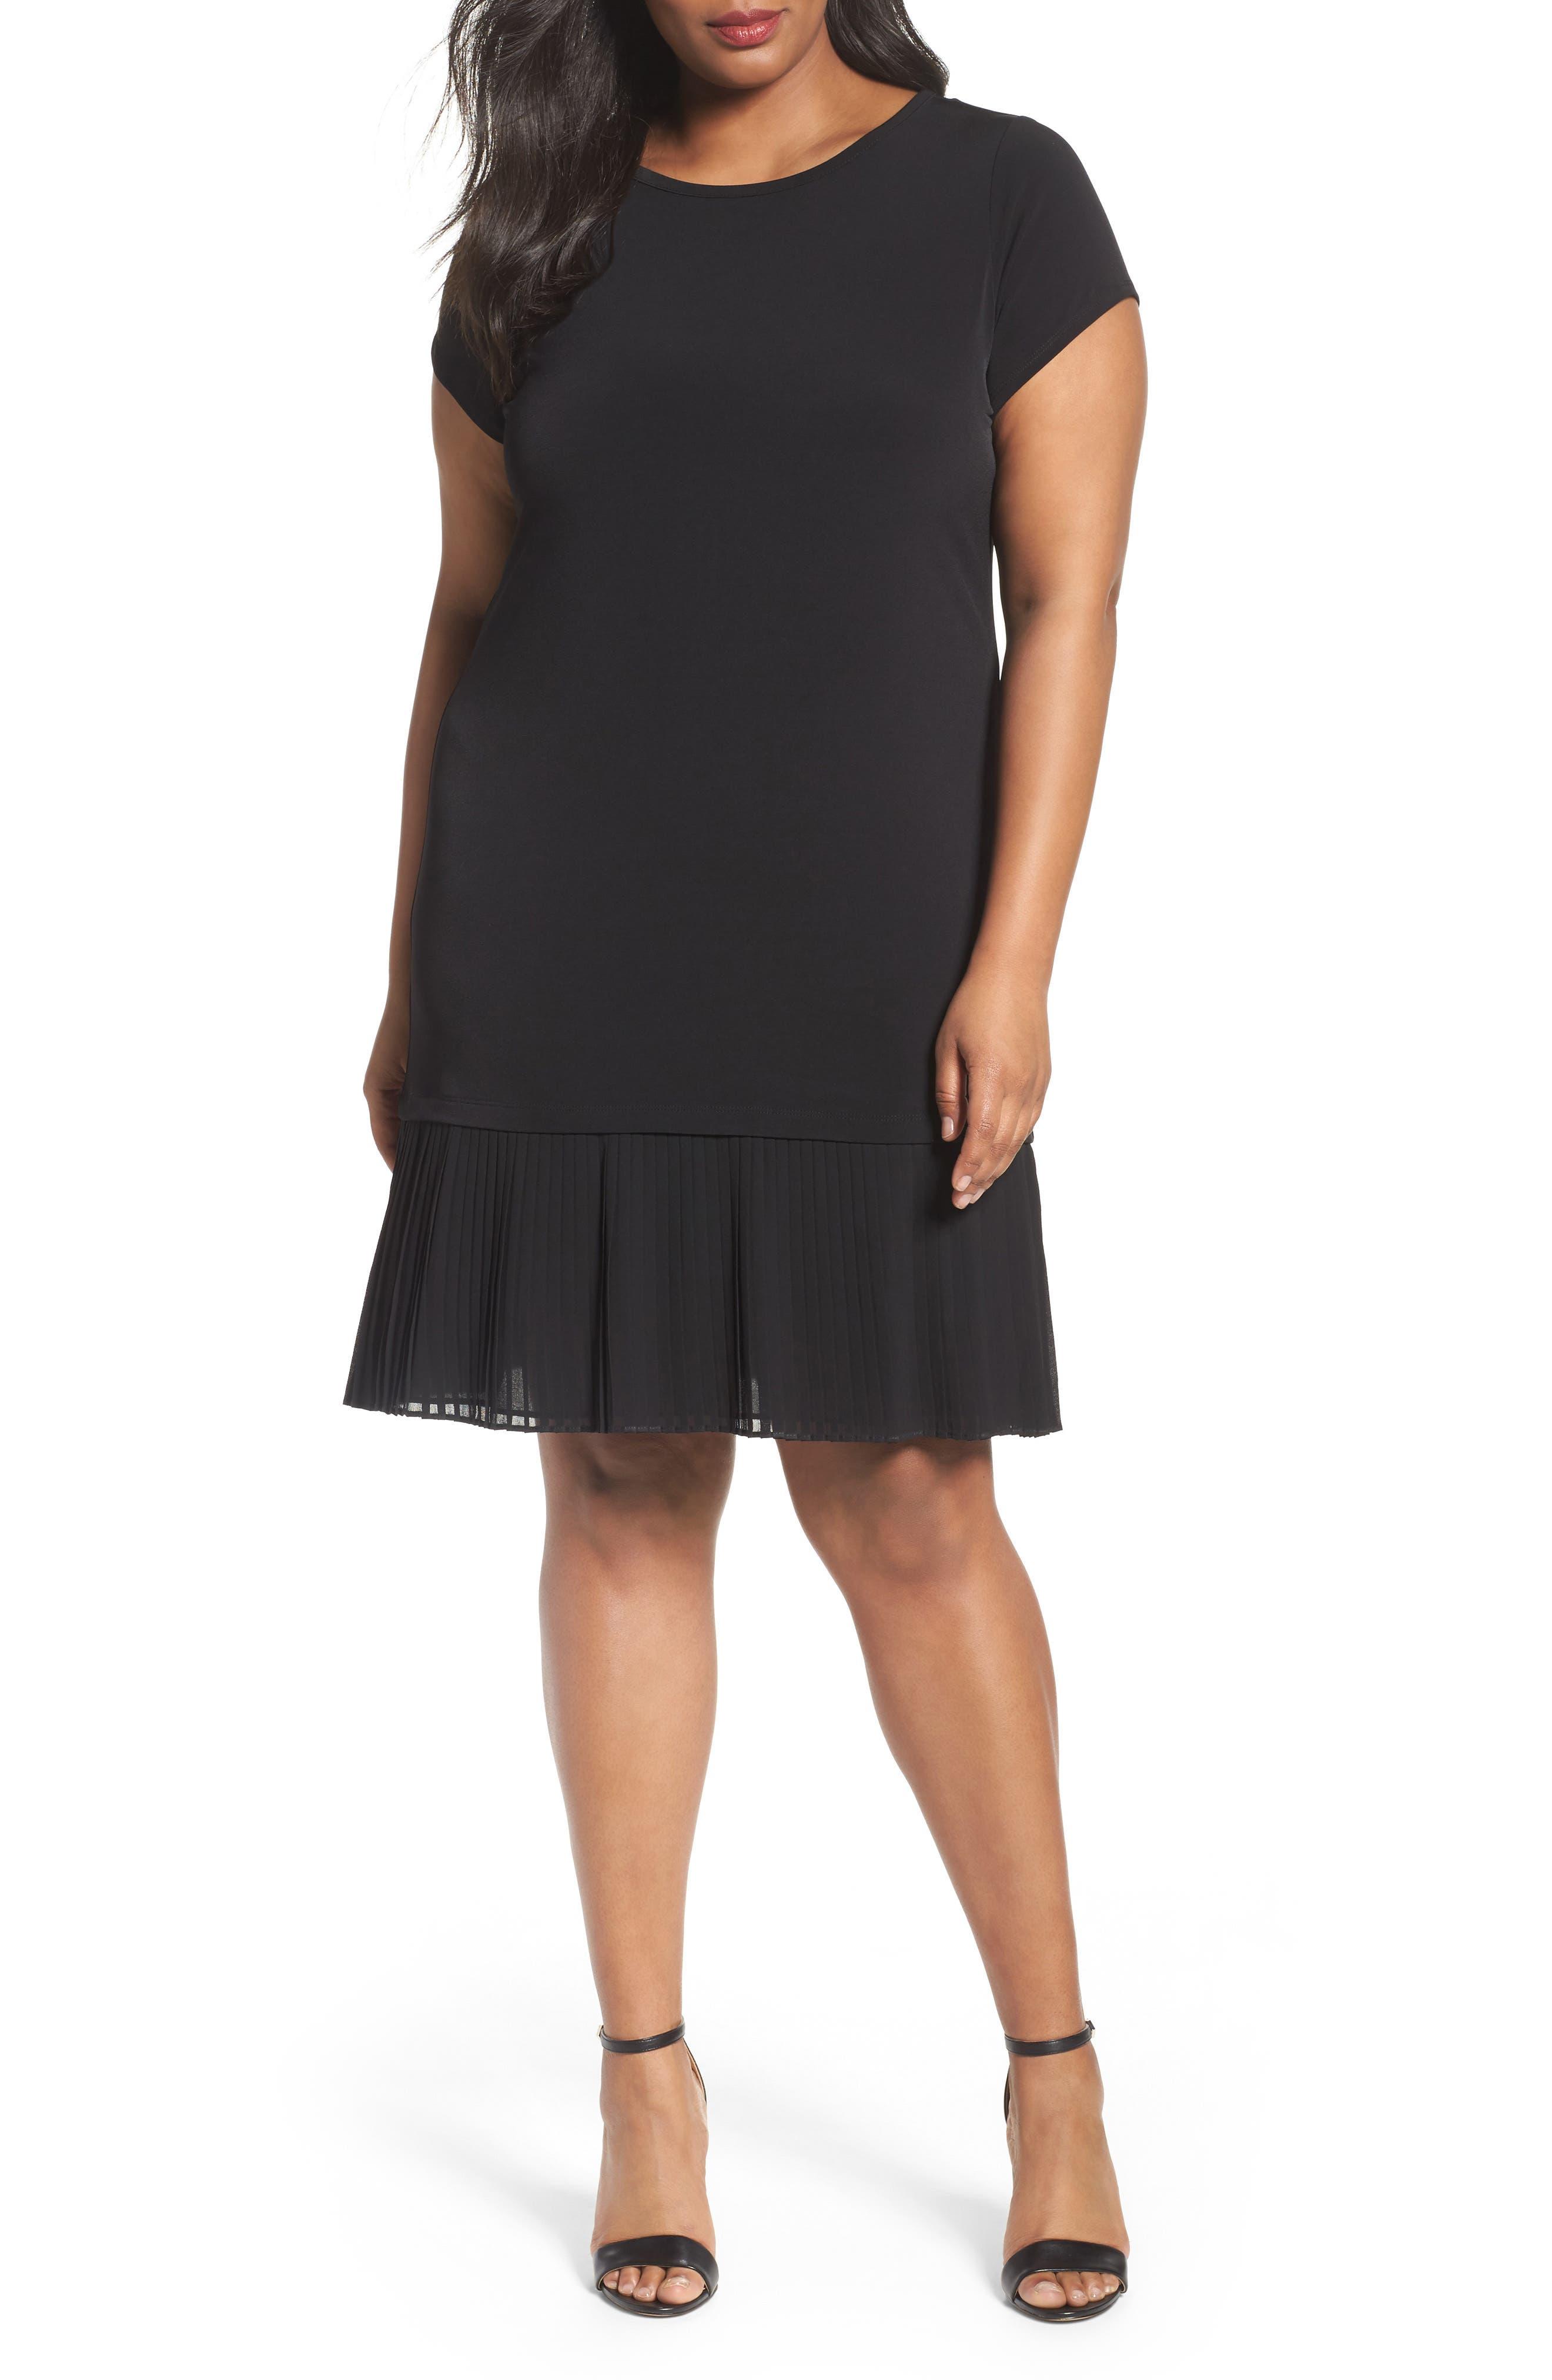 Alternate Image 1 Selected - MICHAEL Michael Kors Pleat Chiffon Hem Jersey Dress (Plus Size)